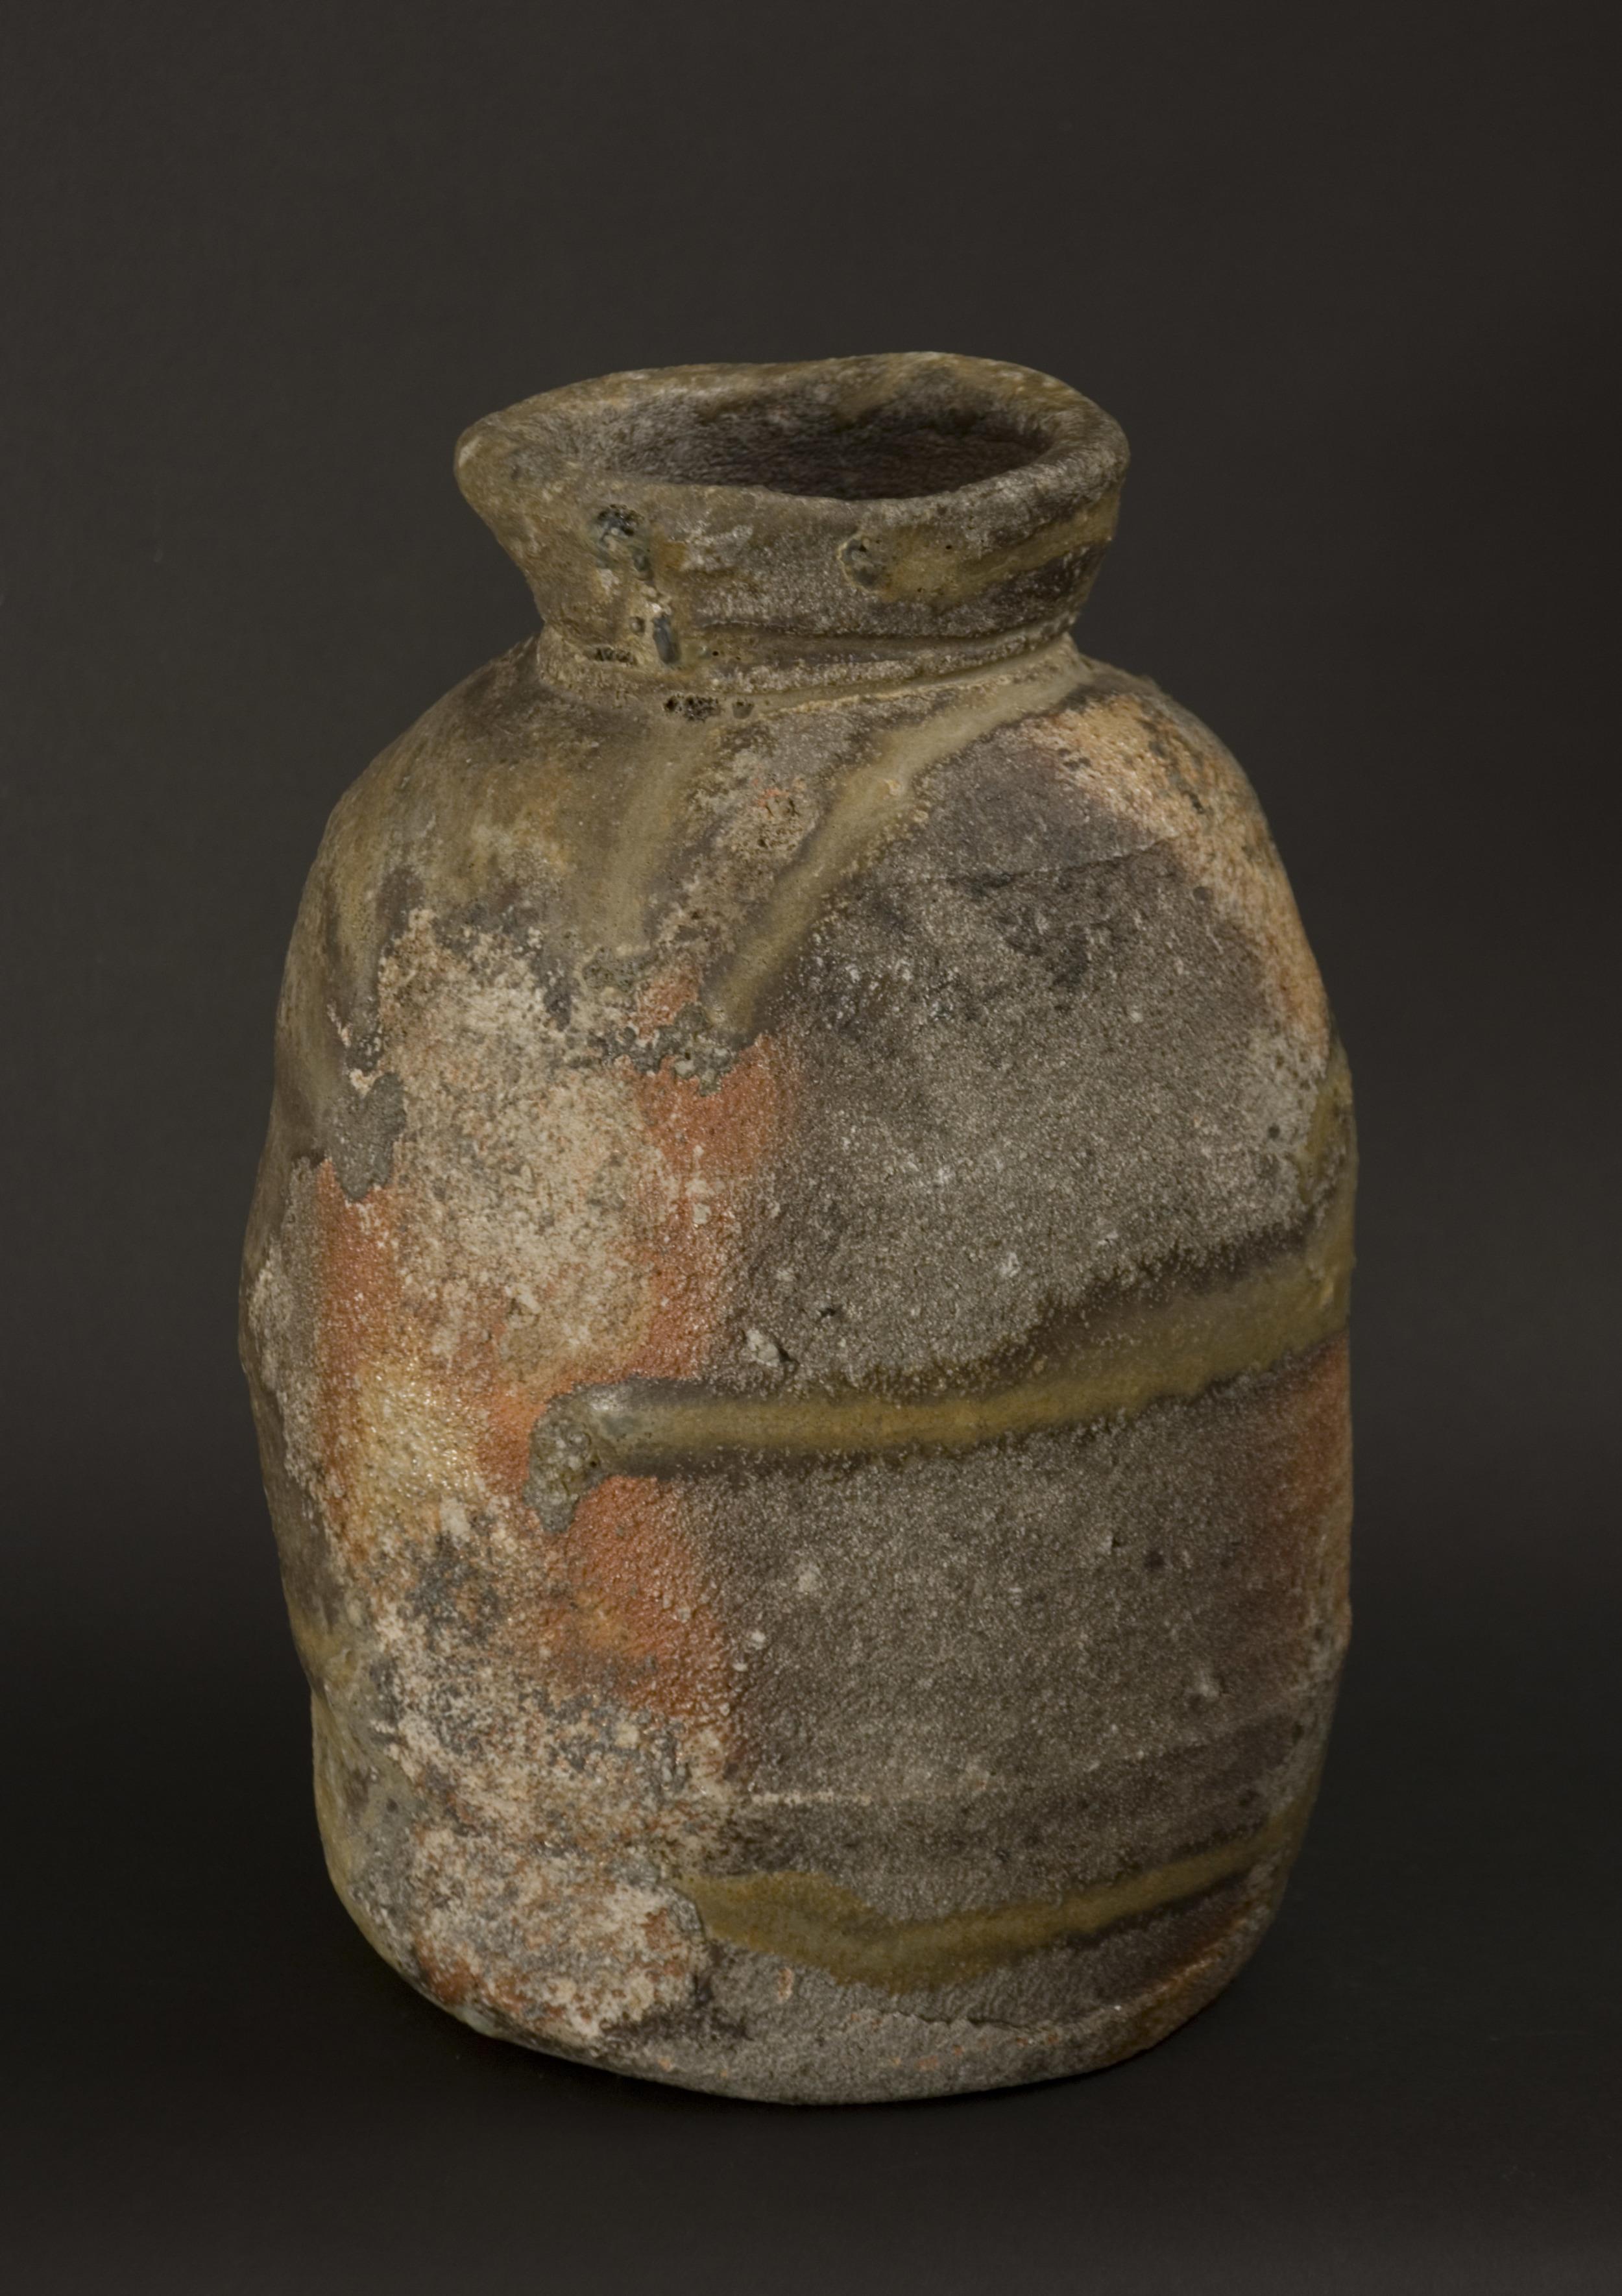 Owen Rye    Bag Form   , 2008 Woodfired stoneware 10 x 6 x 6 inches / 25.4 x 15.2 x 15.2 cm / OWR 2